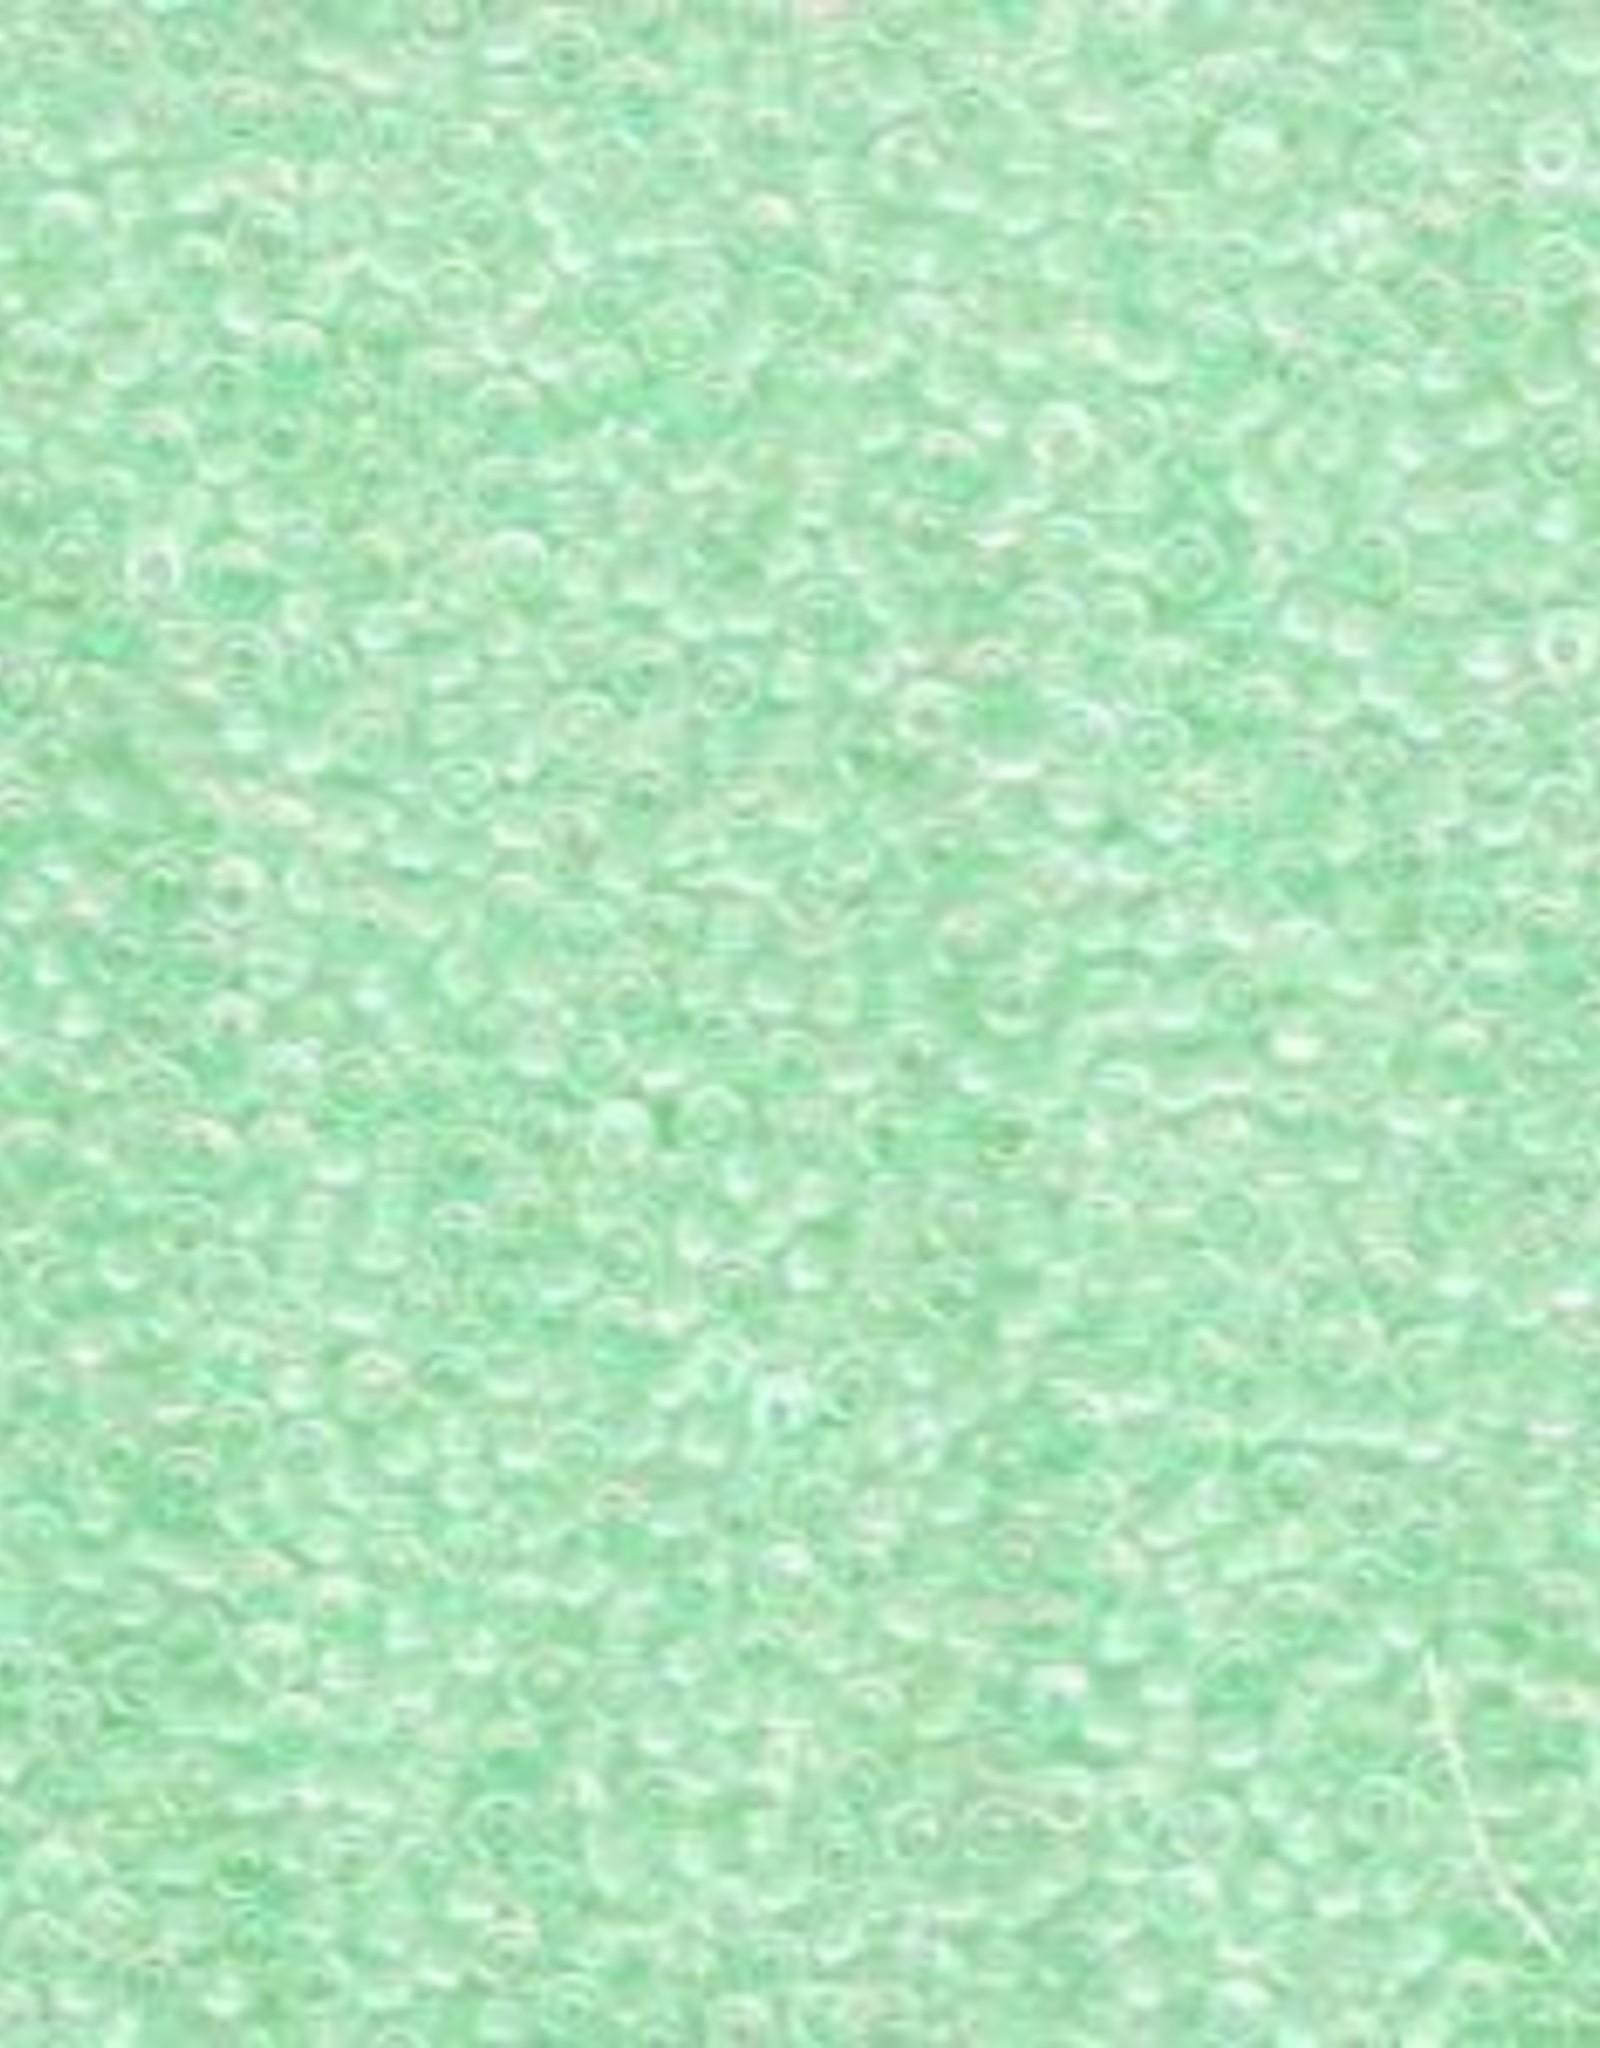 SB11 Mint Green Cylon